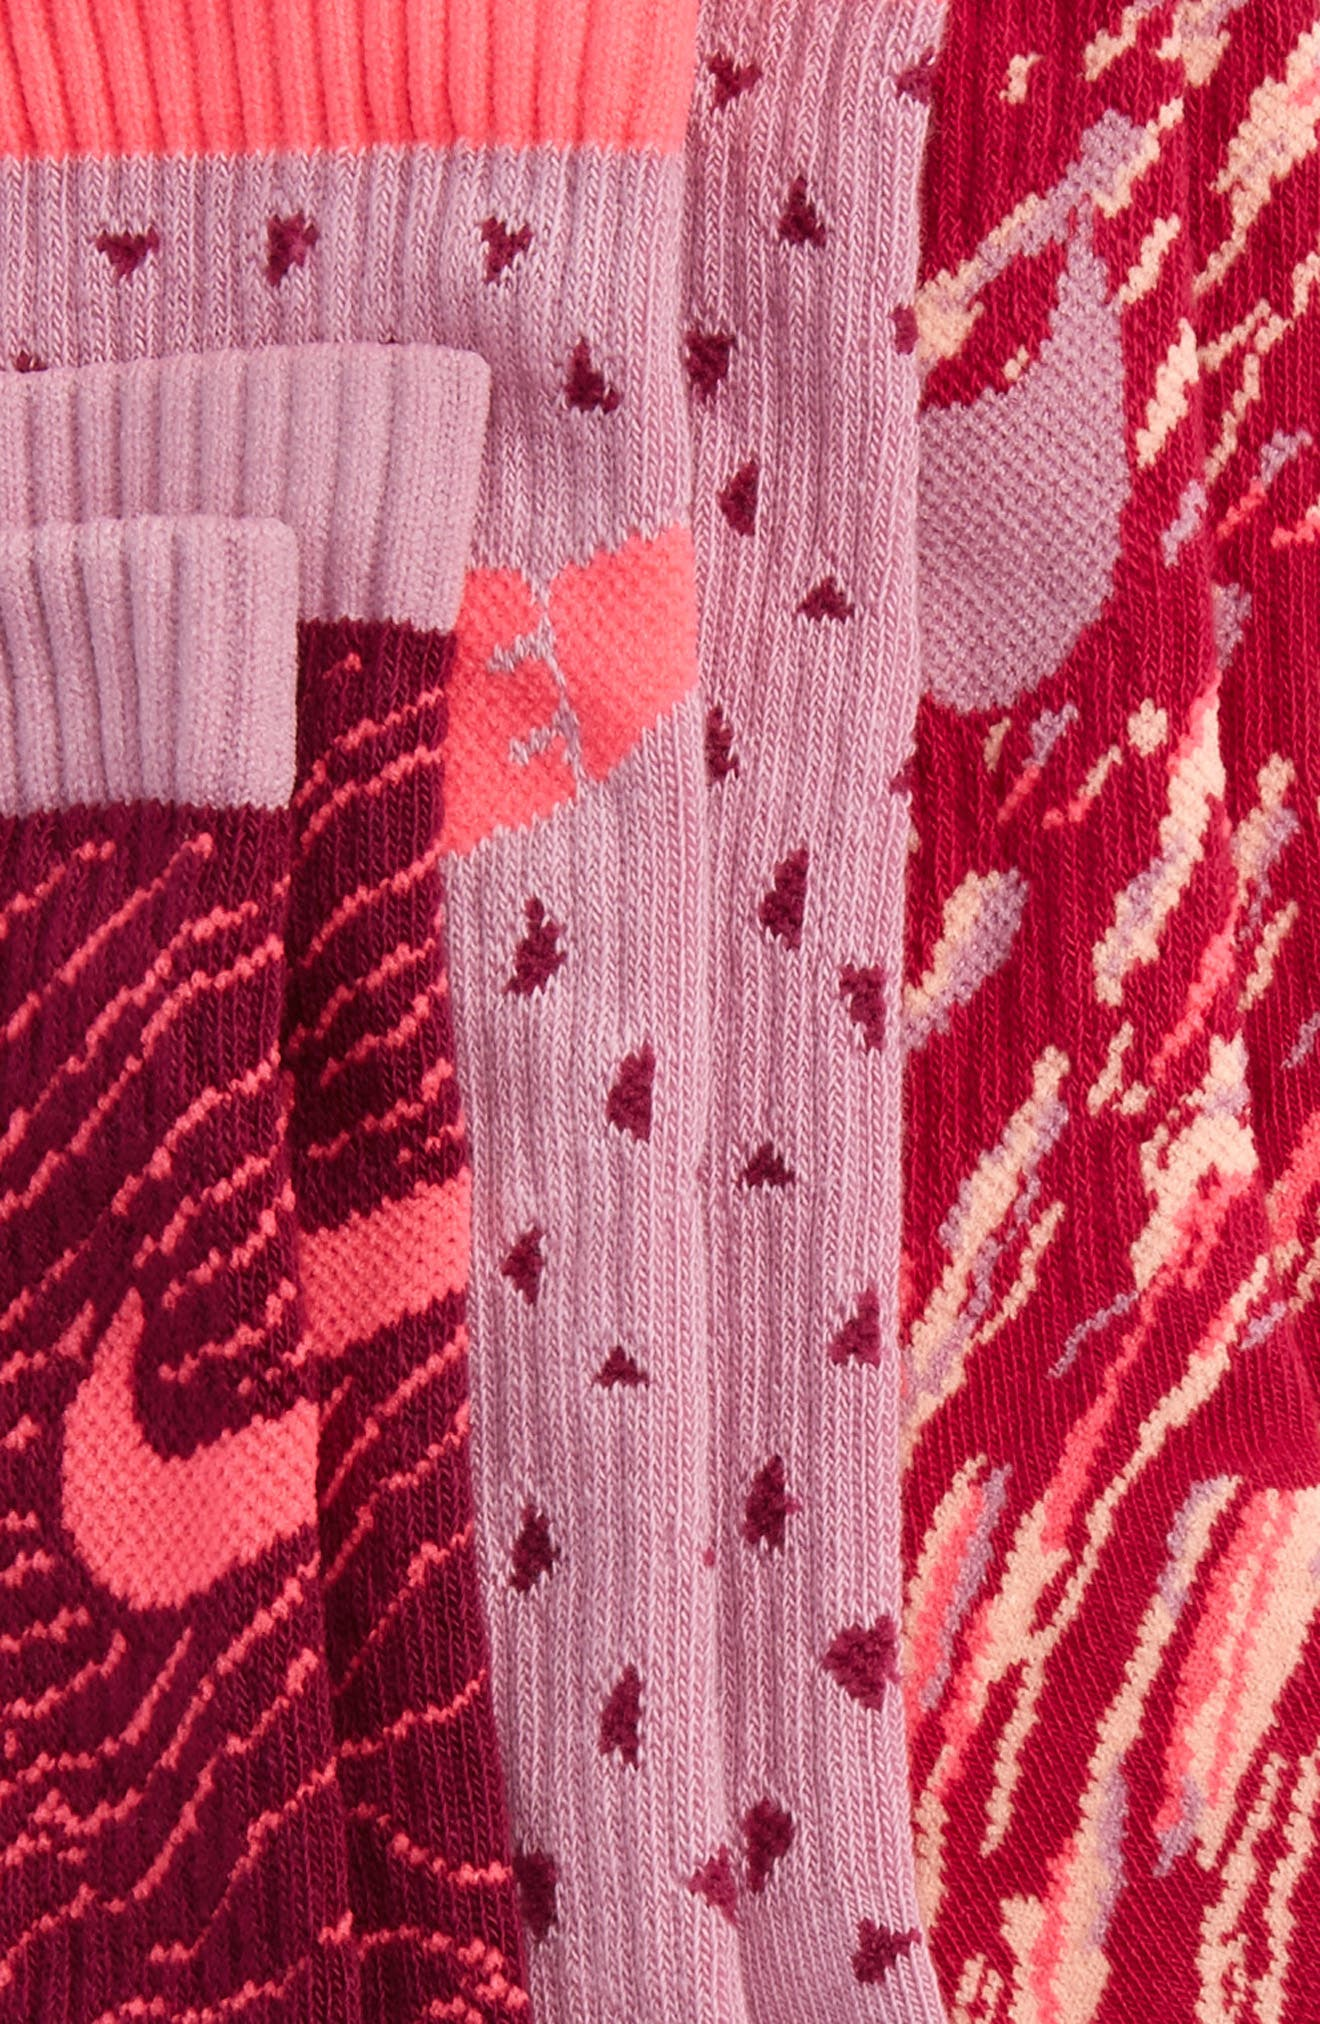 3-Pack Graphic Crew Socks,                             Alternate thumbnail 2, color,                             650